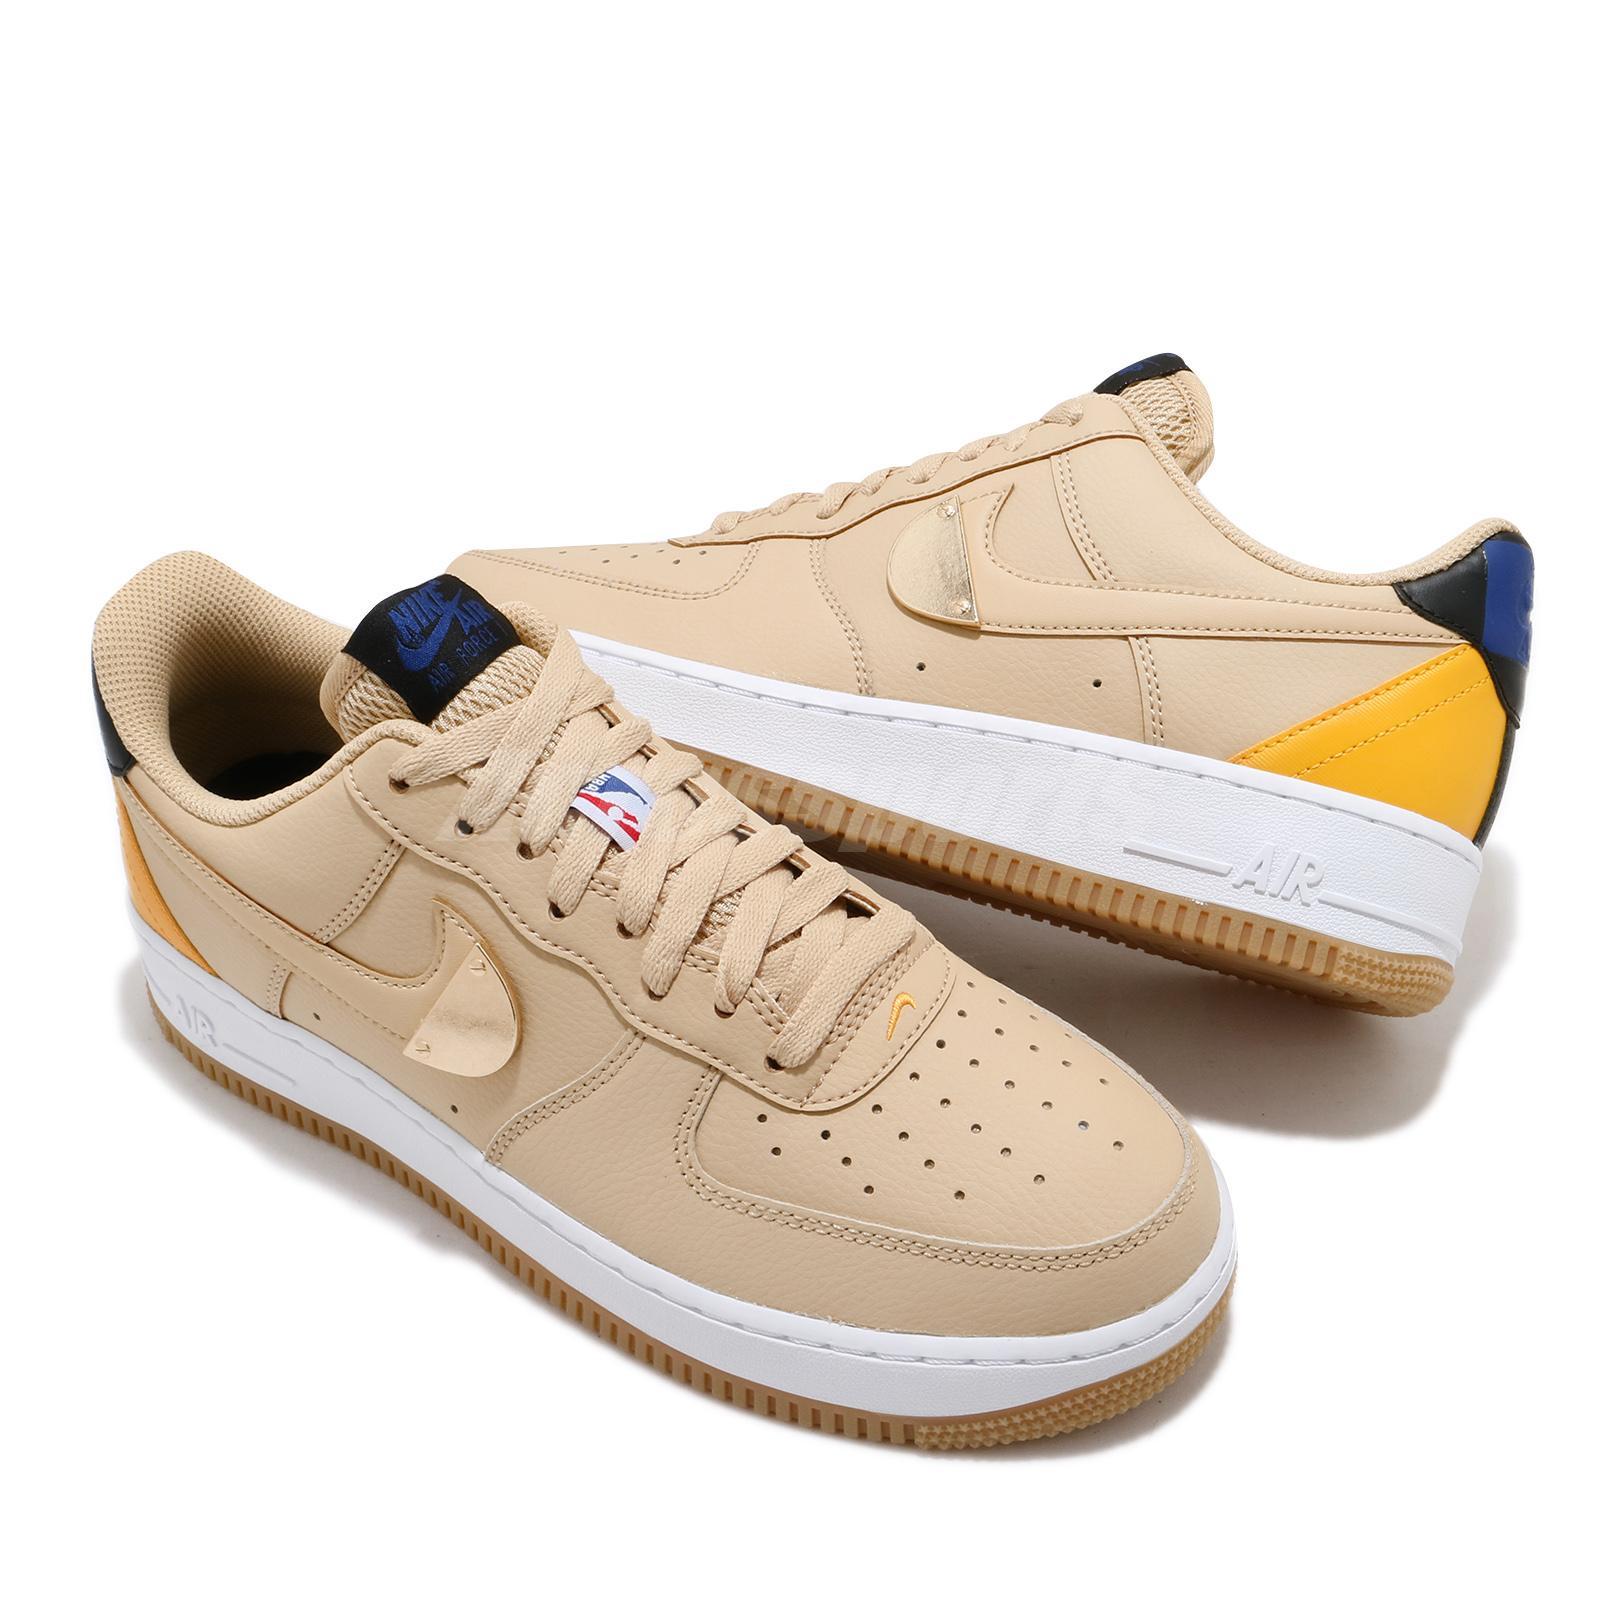 Details about Nike Air Force 1 07 LV8 NBA Sesame University Gold White Gum  Men CT2298-200